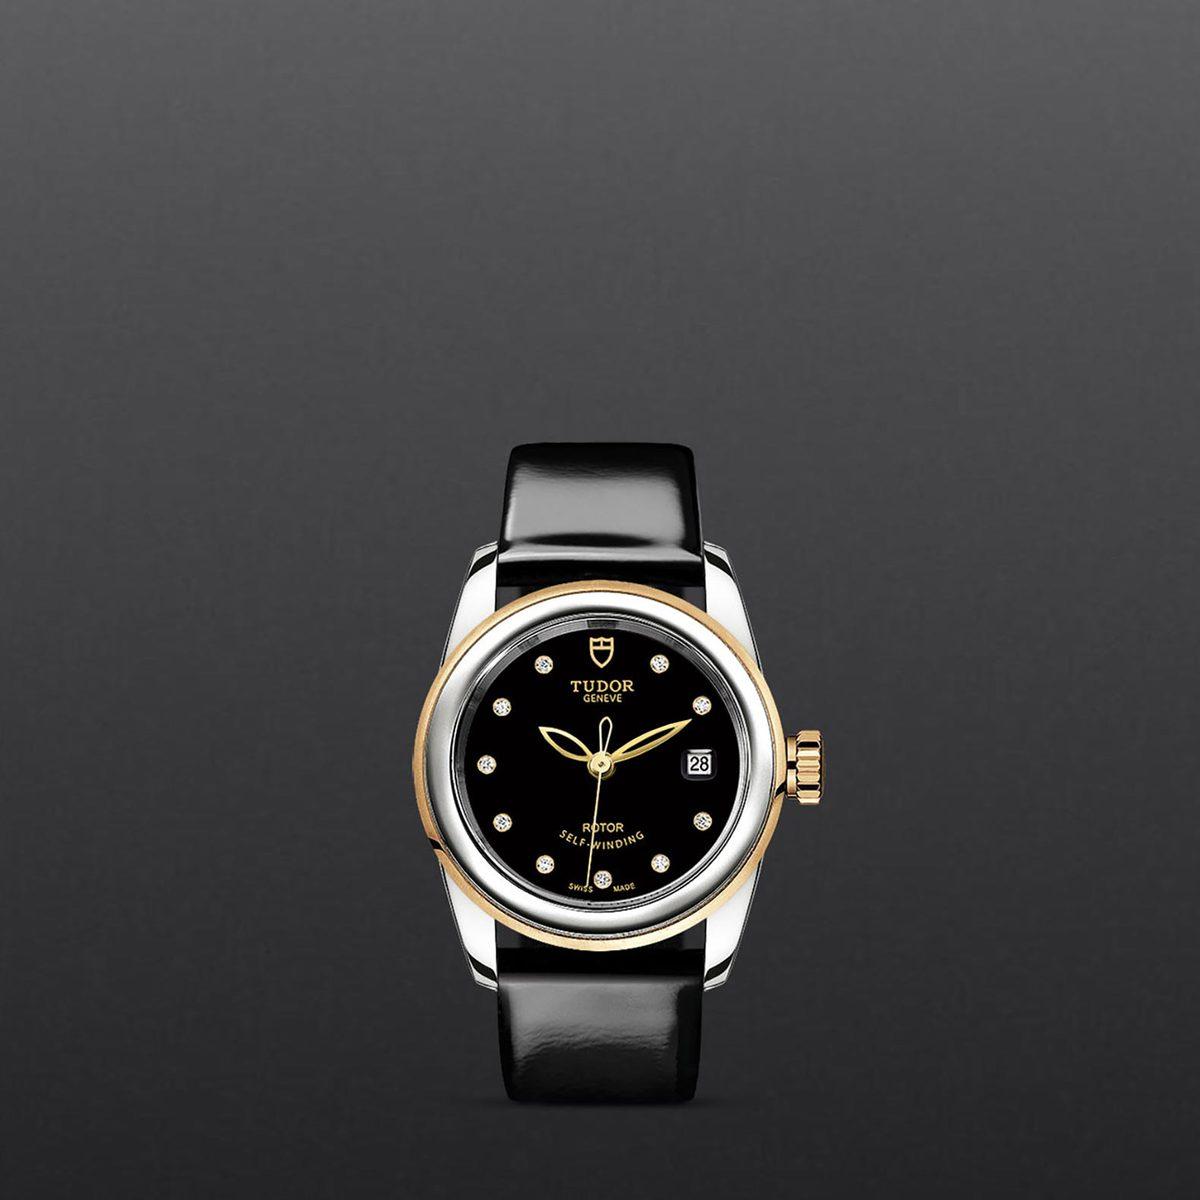 Tudor Glamour Date M51003-0023